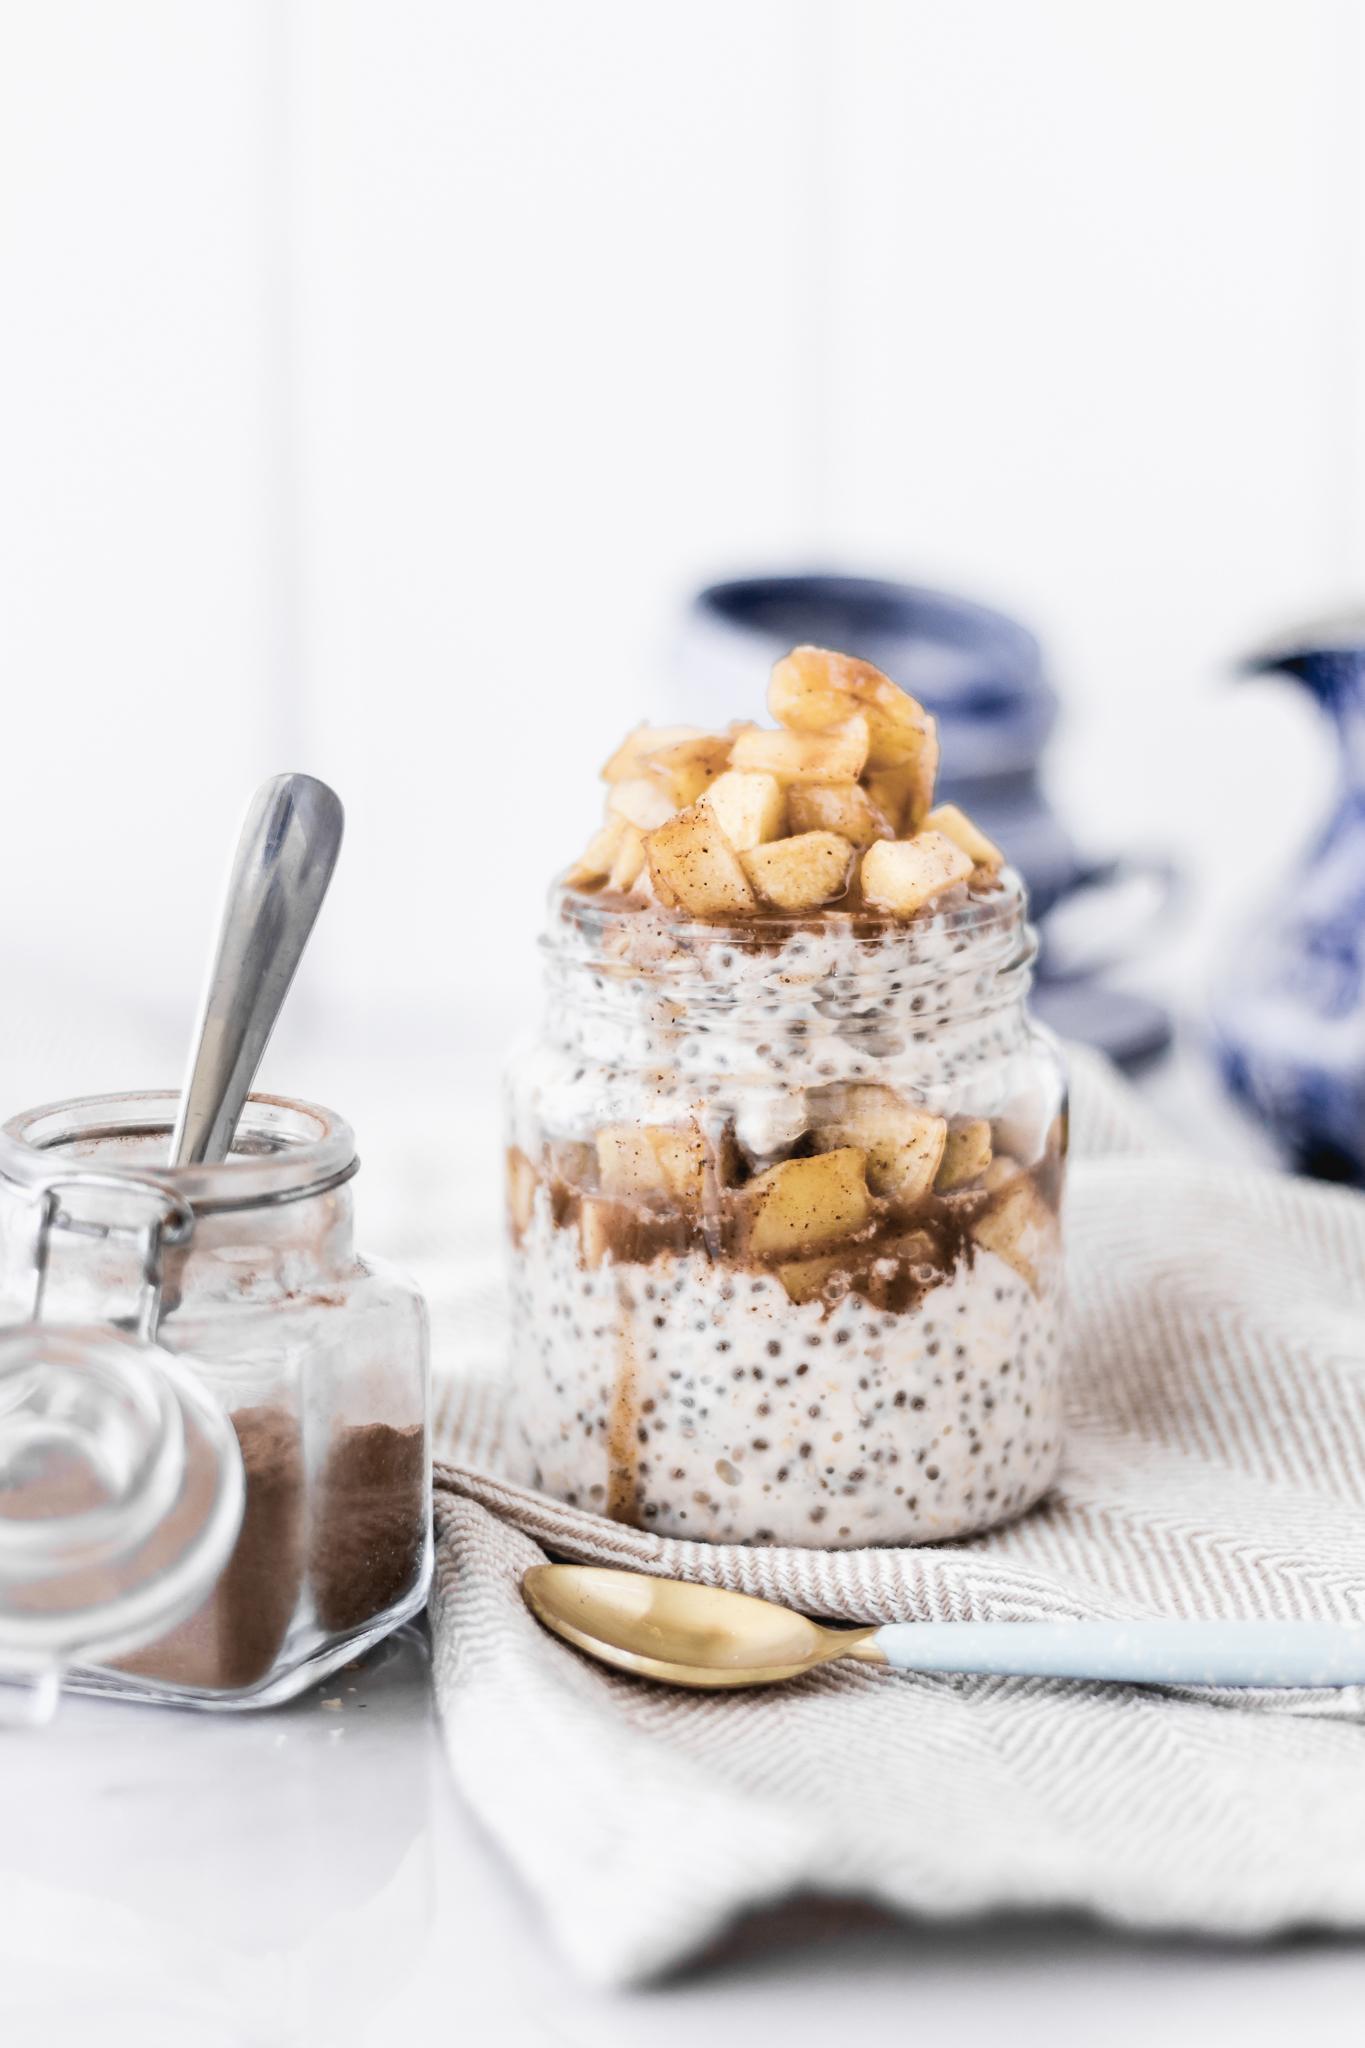 Cómo preparar overnight oats